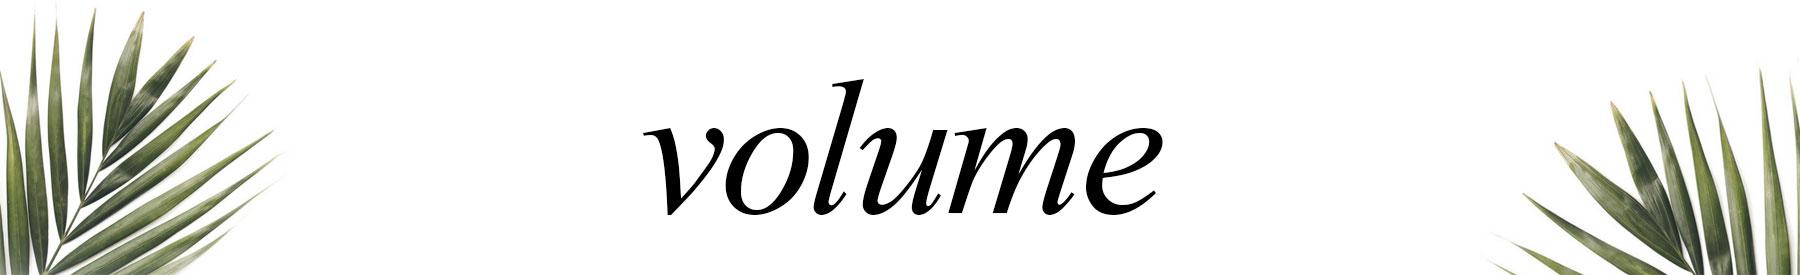 Volumizing Products at HAUS Salon